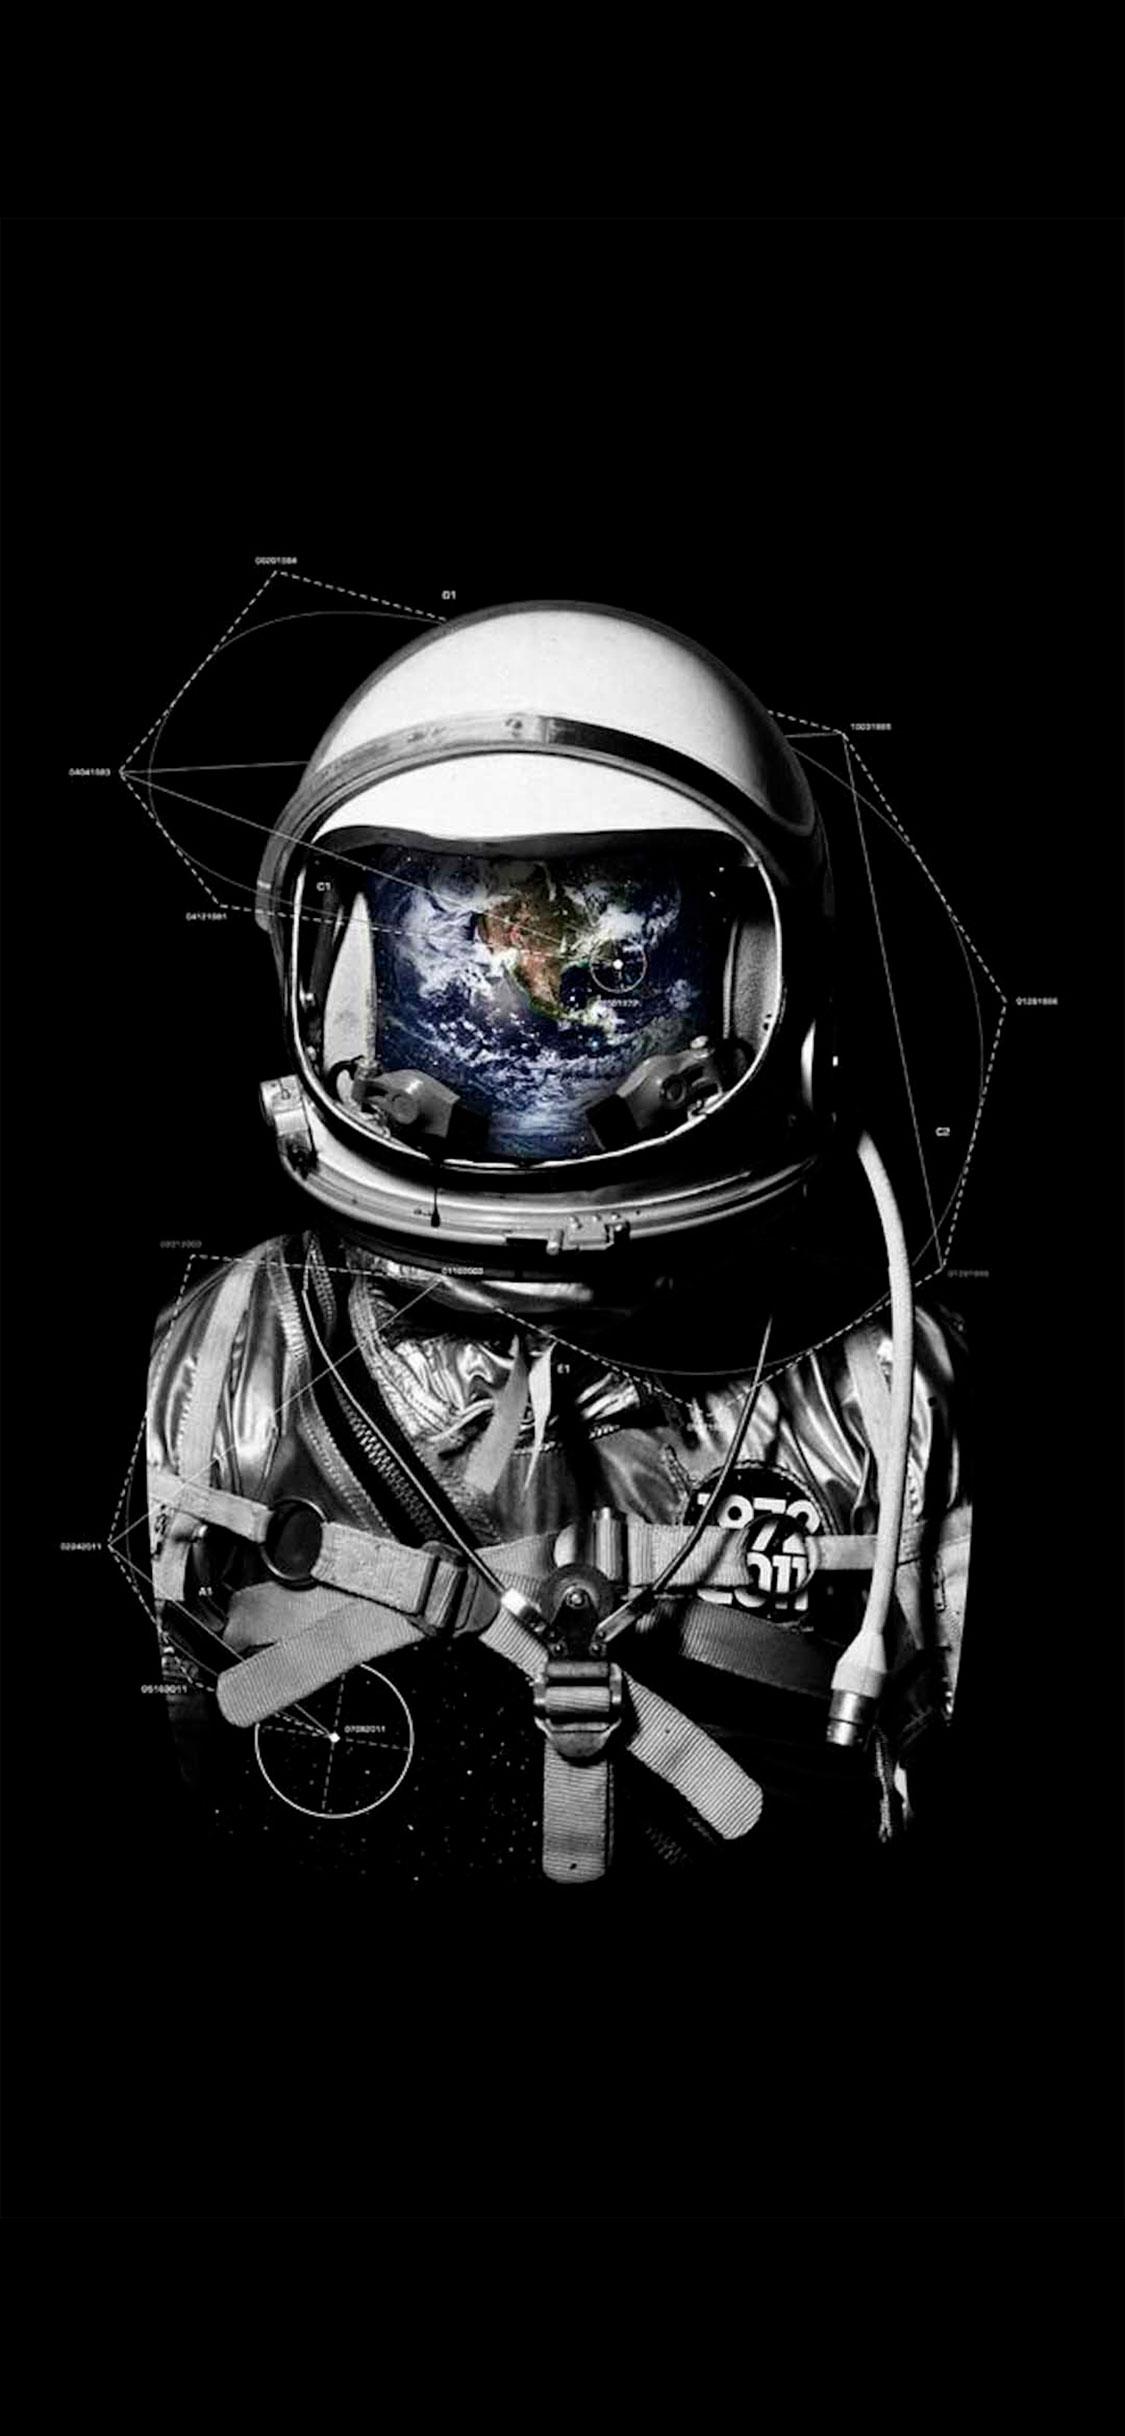 iPhone wallpaper astronaut2 Fonds d'écran iPhone du 22/05/2018